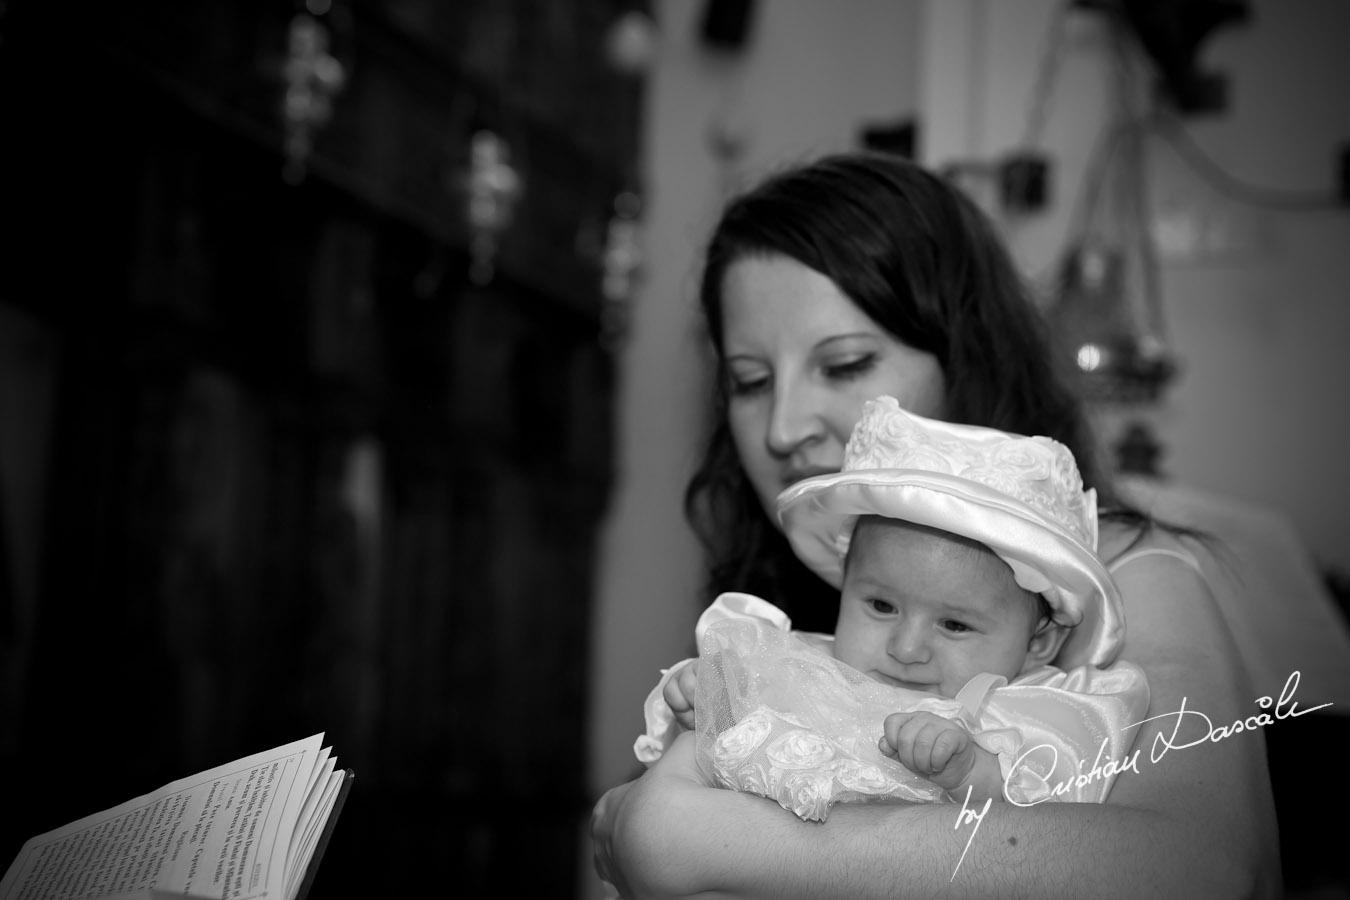 Diana's Christening - Cyprus Christening Photography. Photographer: Cristian Dascalu